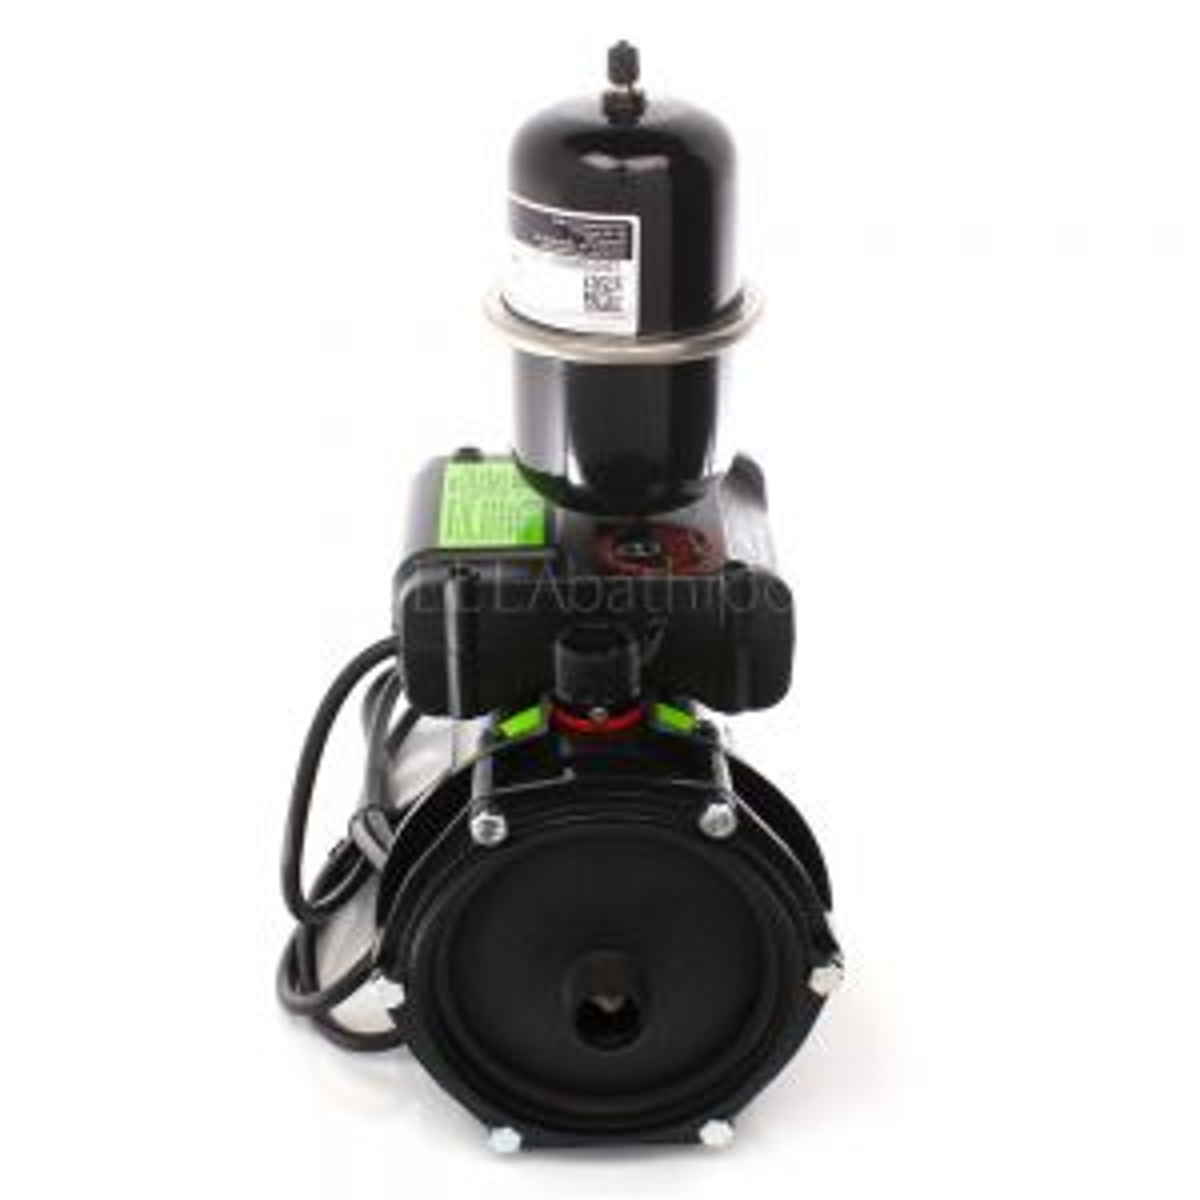 Salamander RP80SU 2.4 Bar Single Universal Whole House Shower Pump Left Side